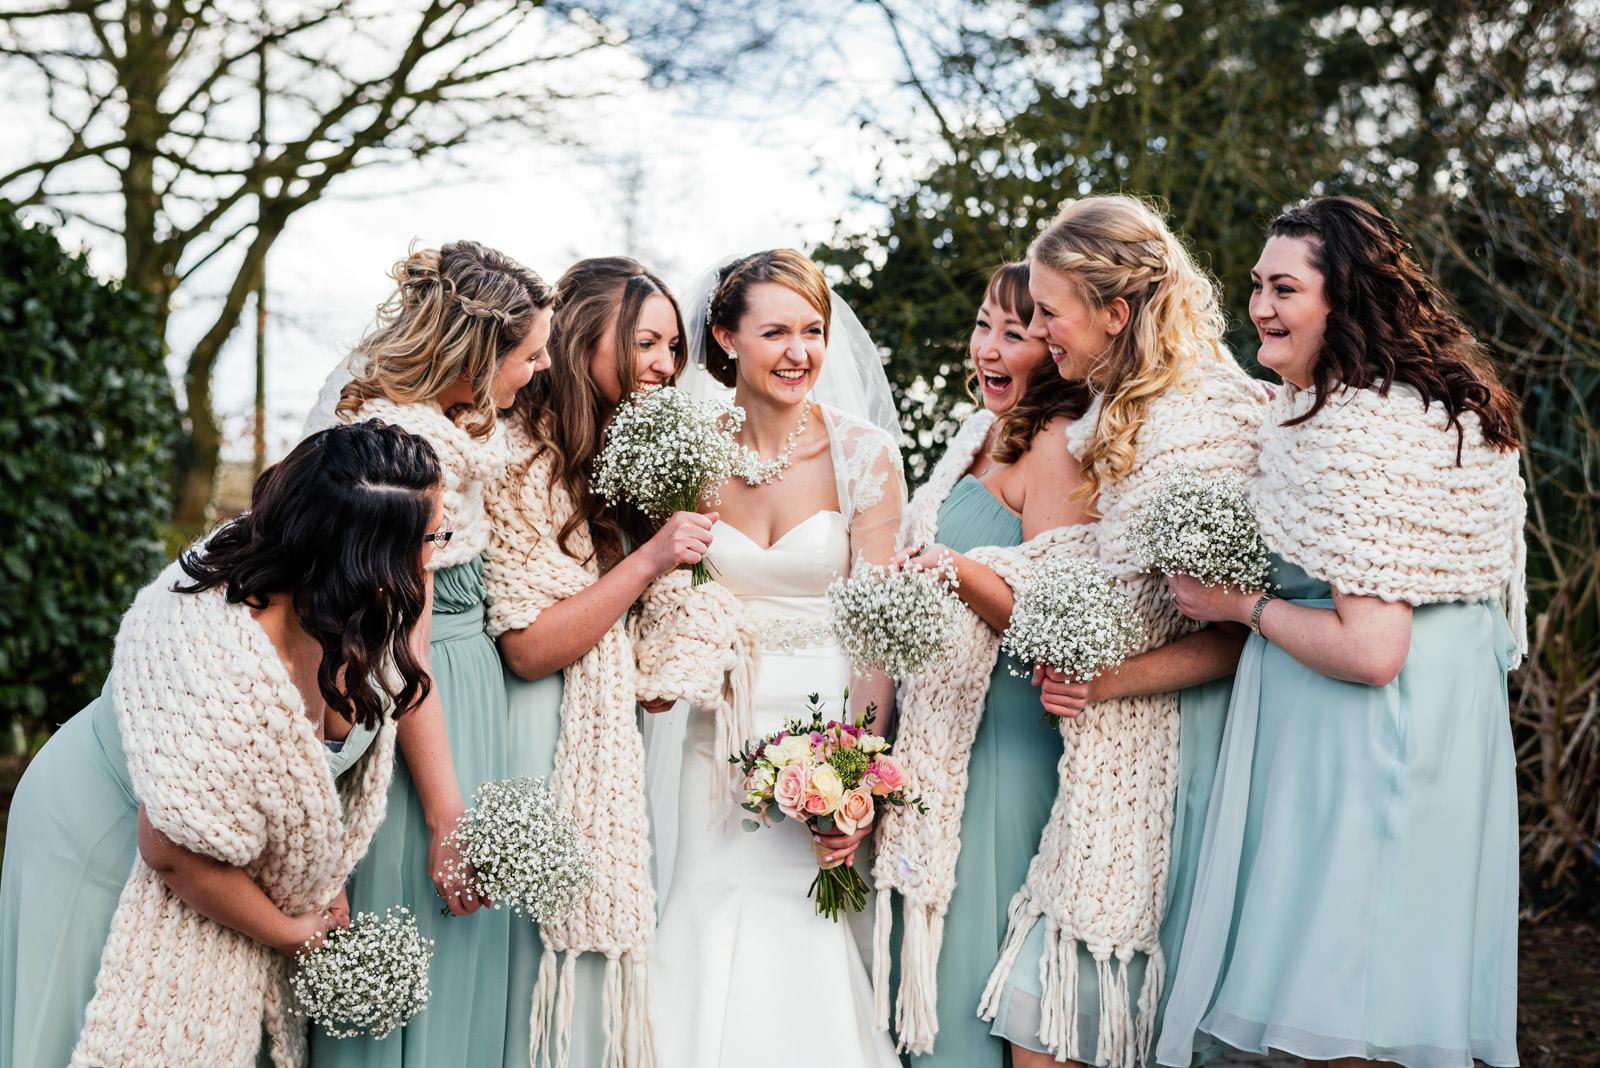 informal bridesmaids group photo